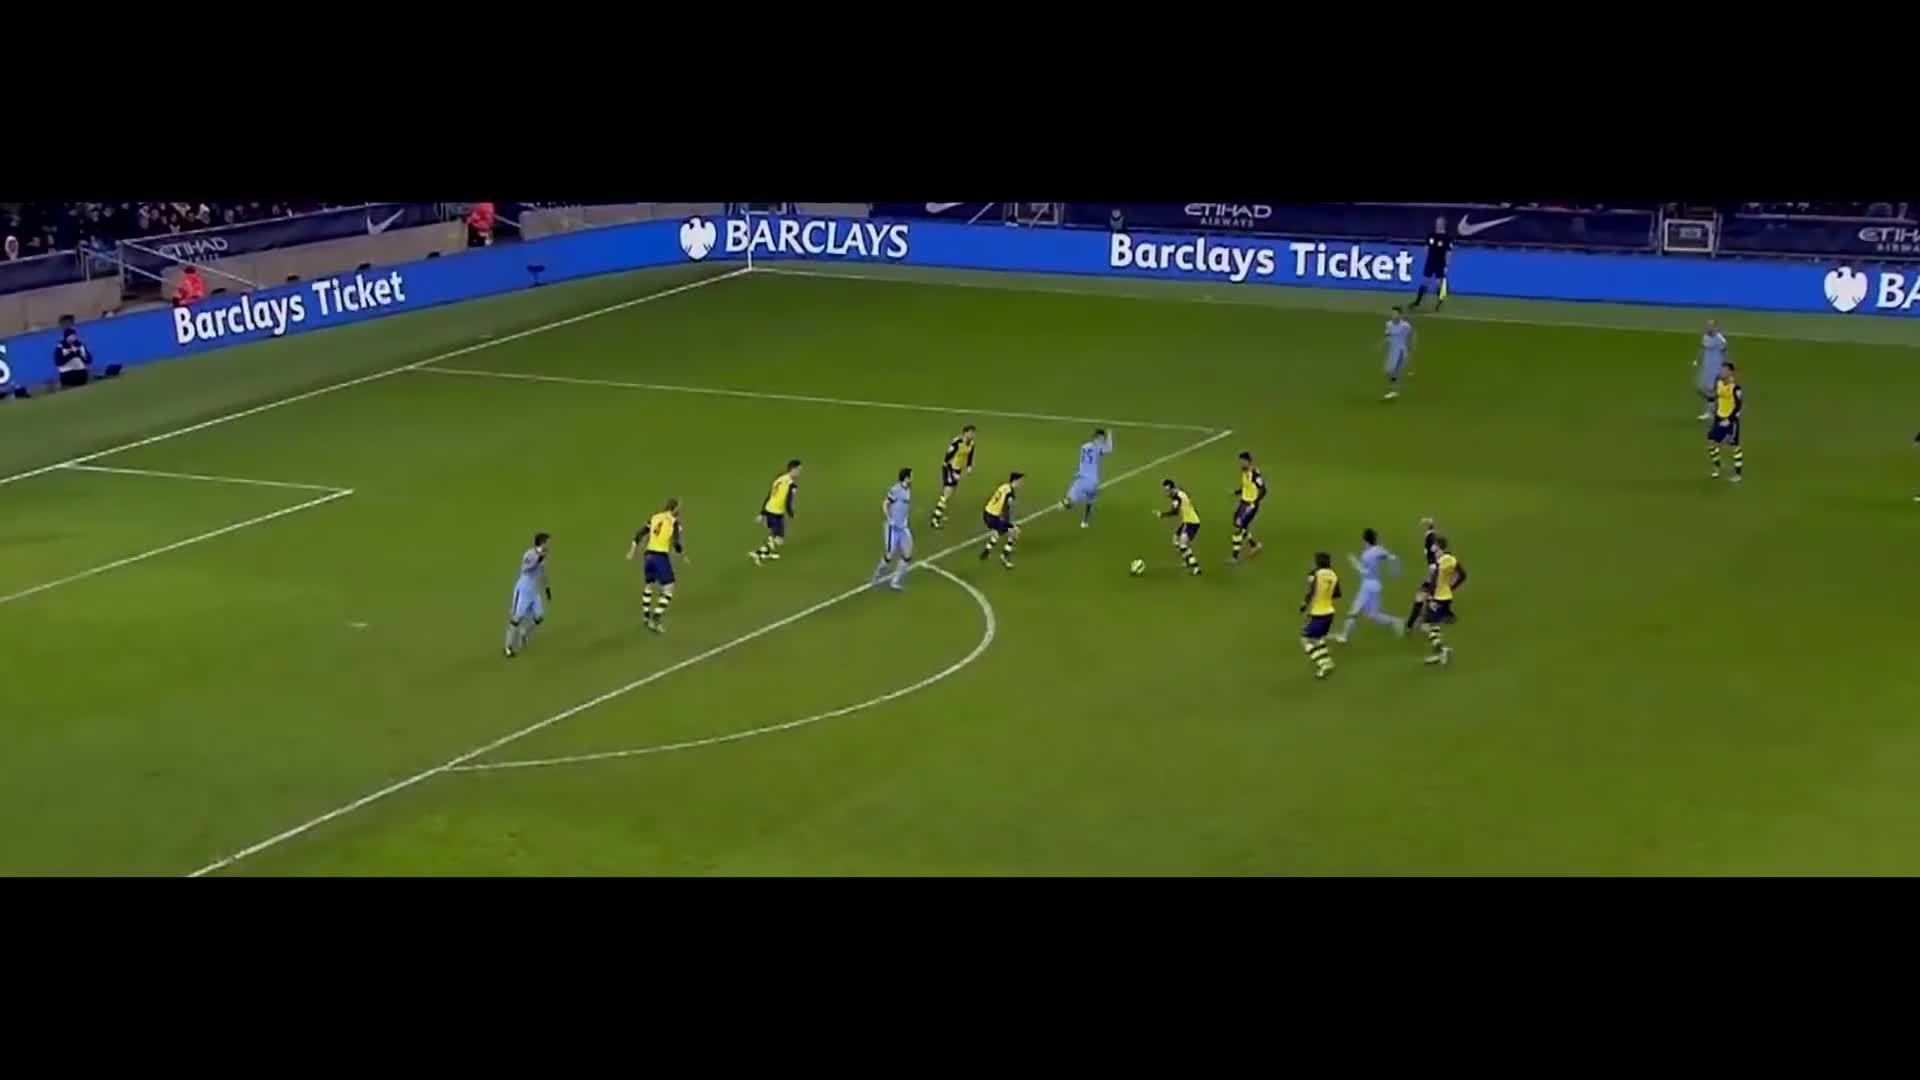 gunners, Santi Cazorla vs Manchester City - Short Version - 18/1/15 HD GIFs